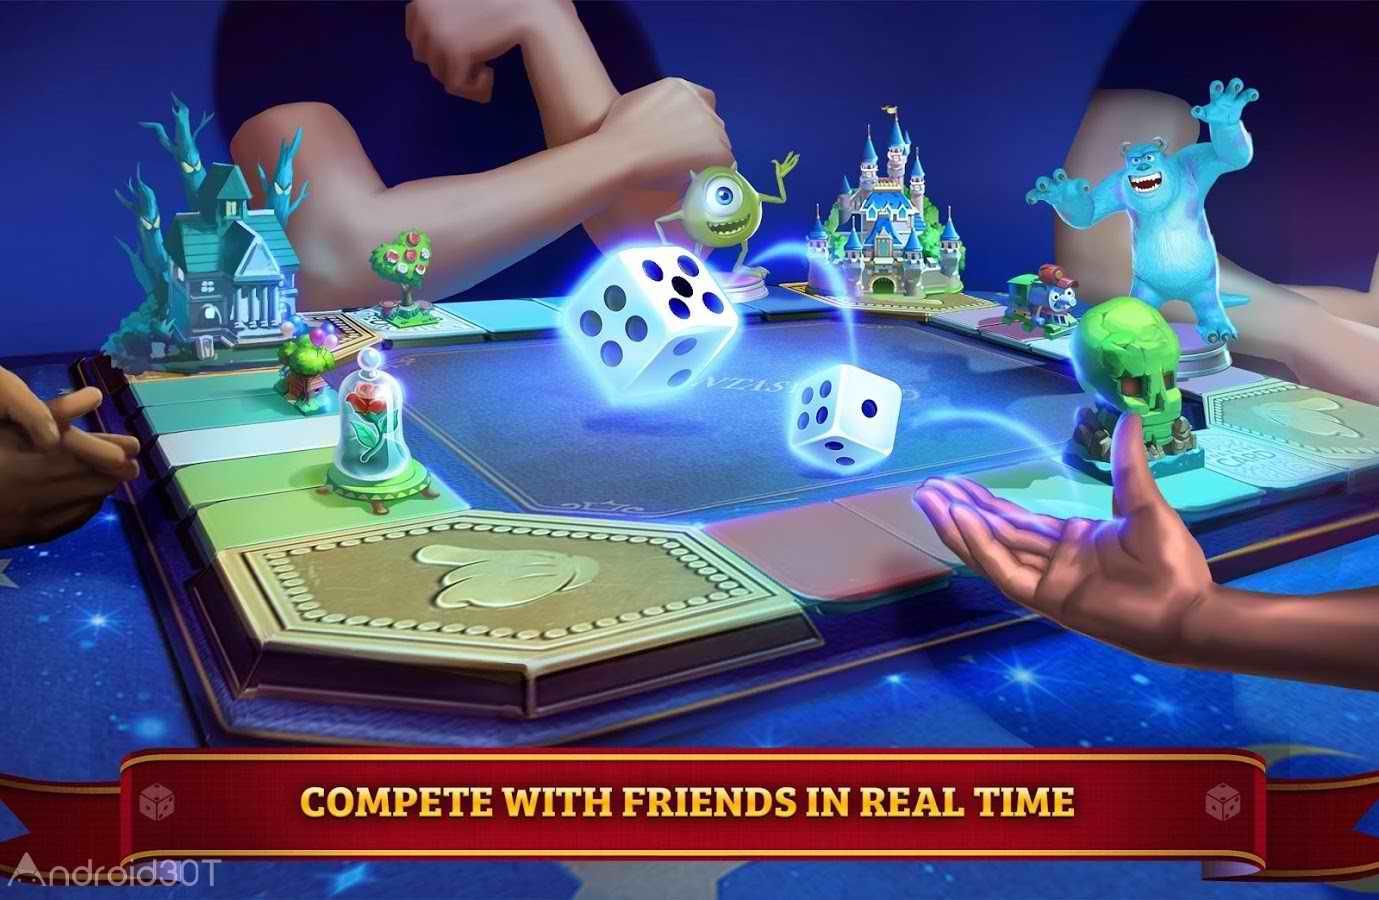 دانلود Disney Magical Dice : The Enchanted Board Game 1.54.5 – بازی تاس جادویی اندروید